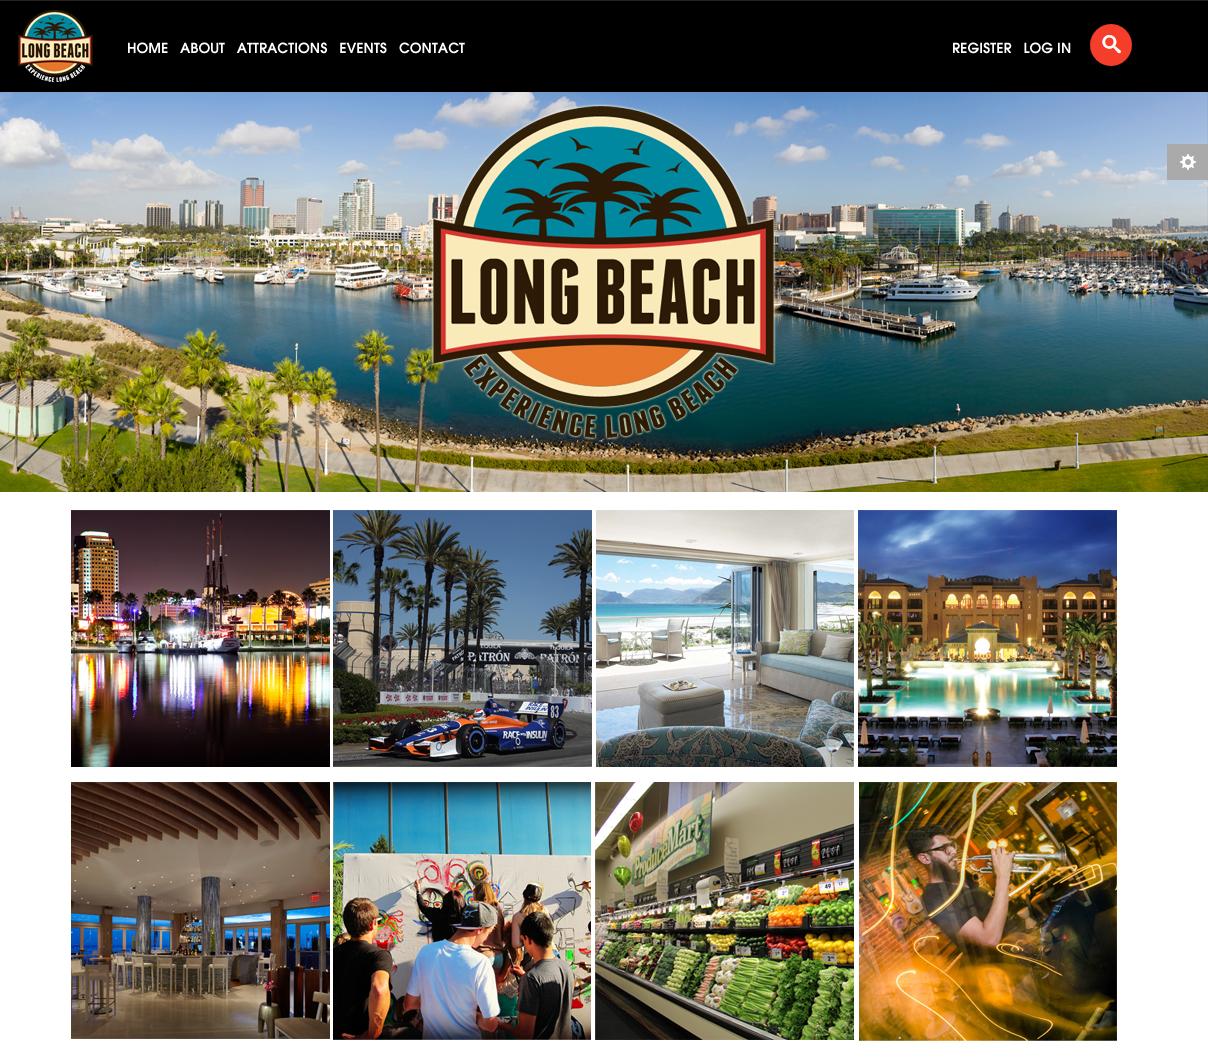 Experience Long Beach